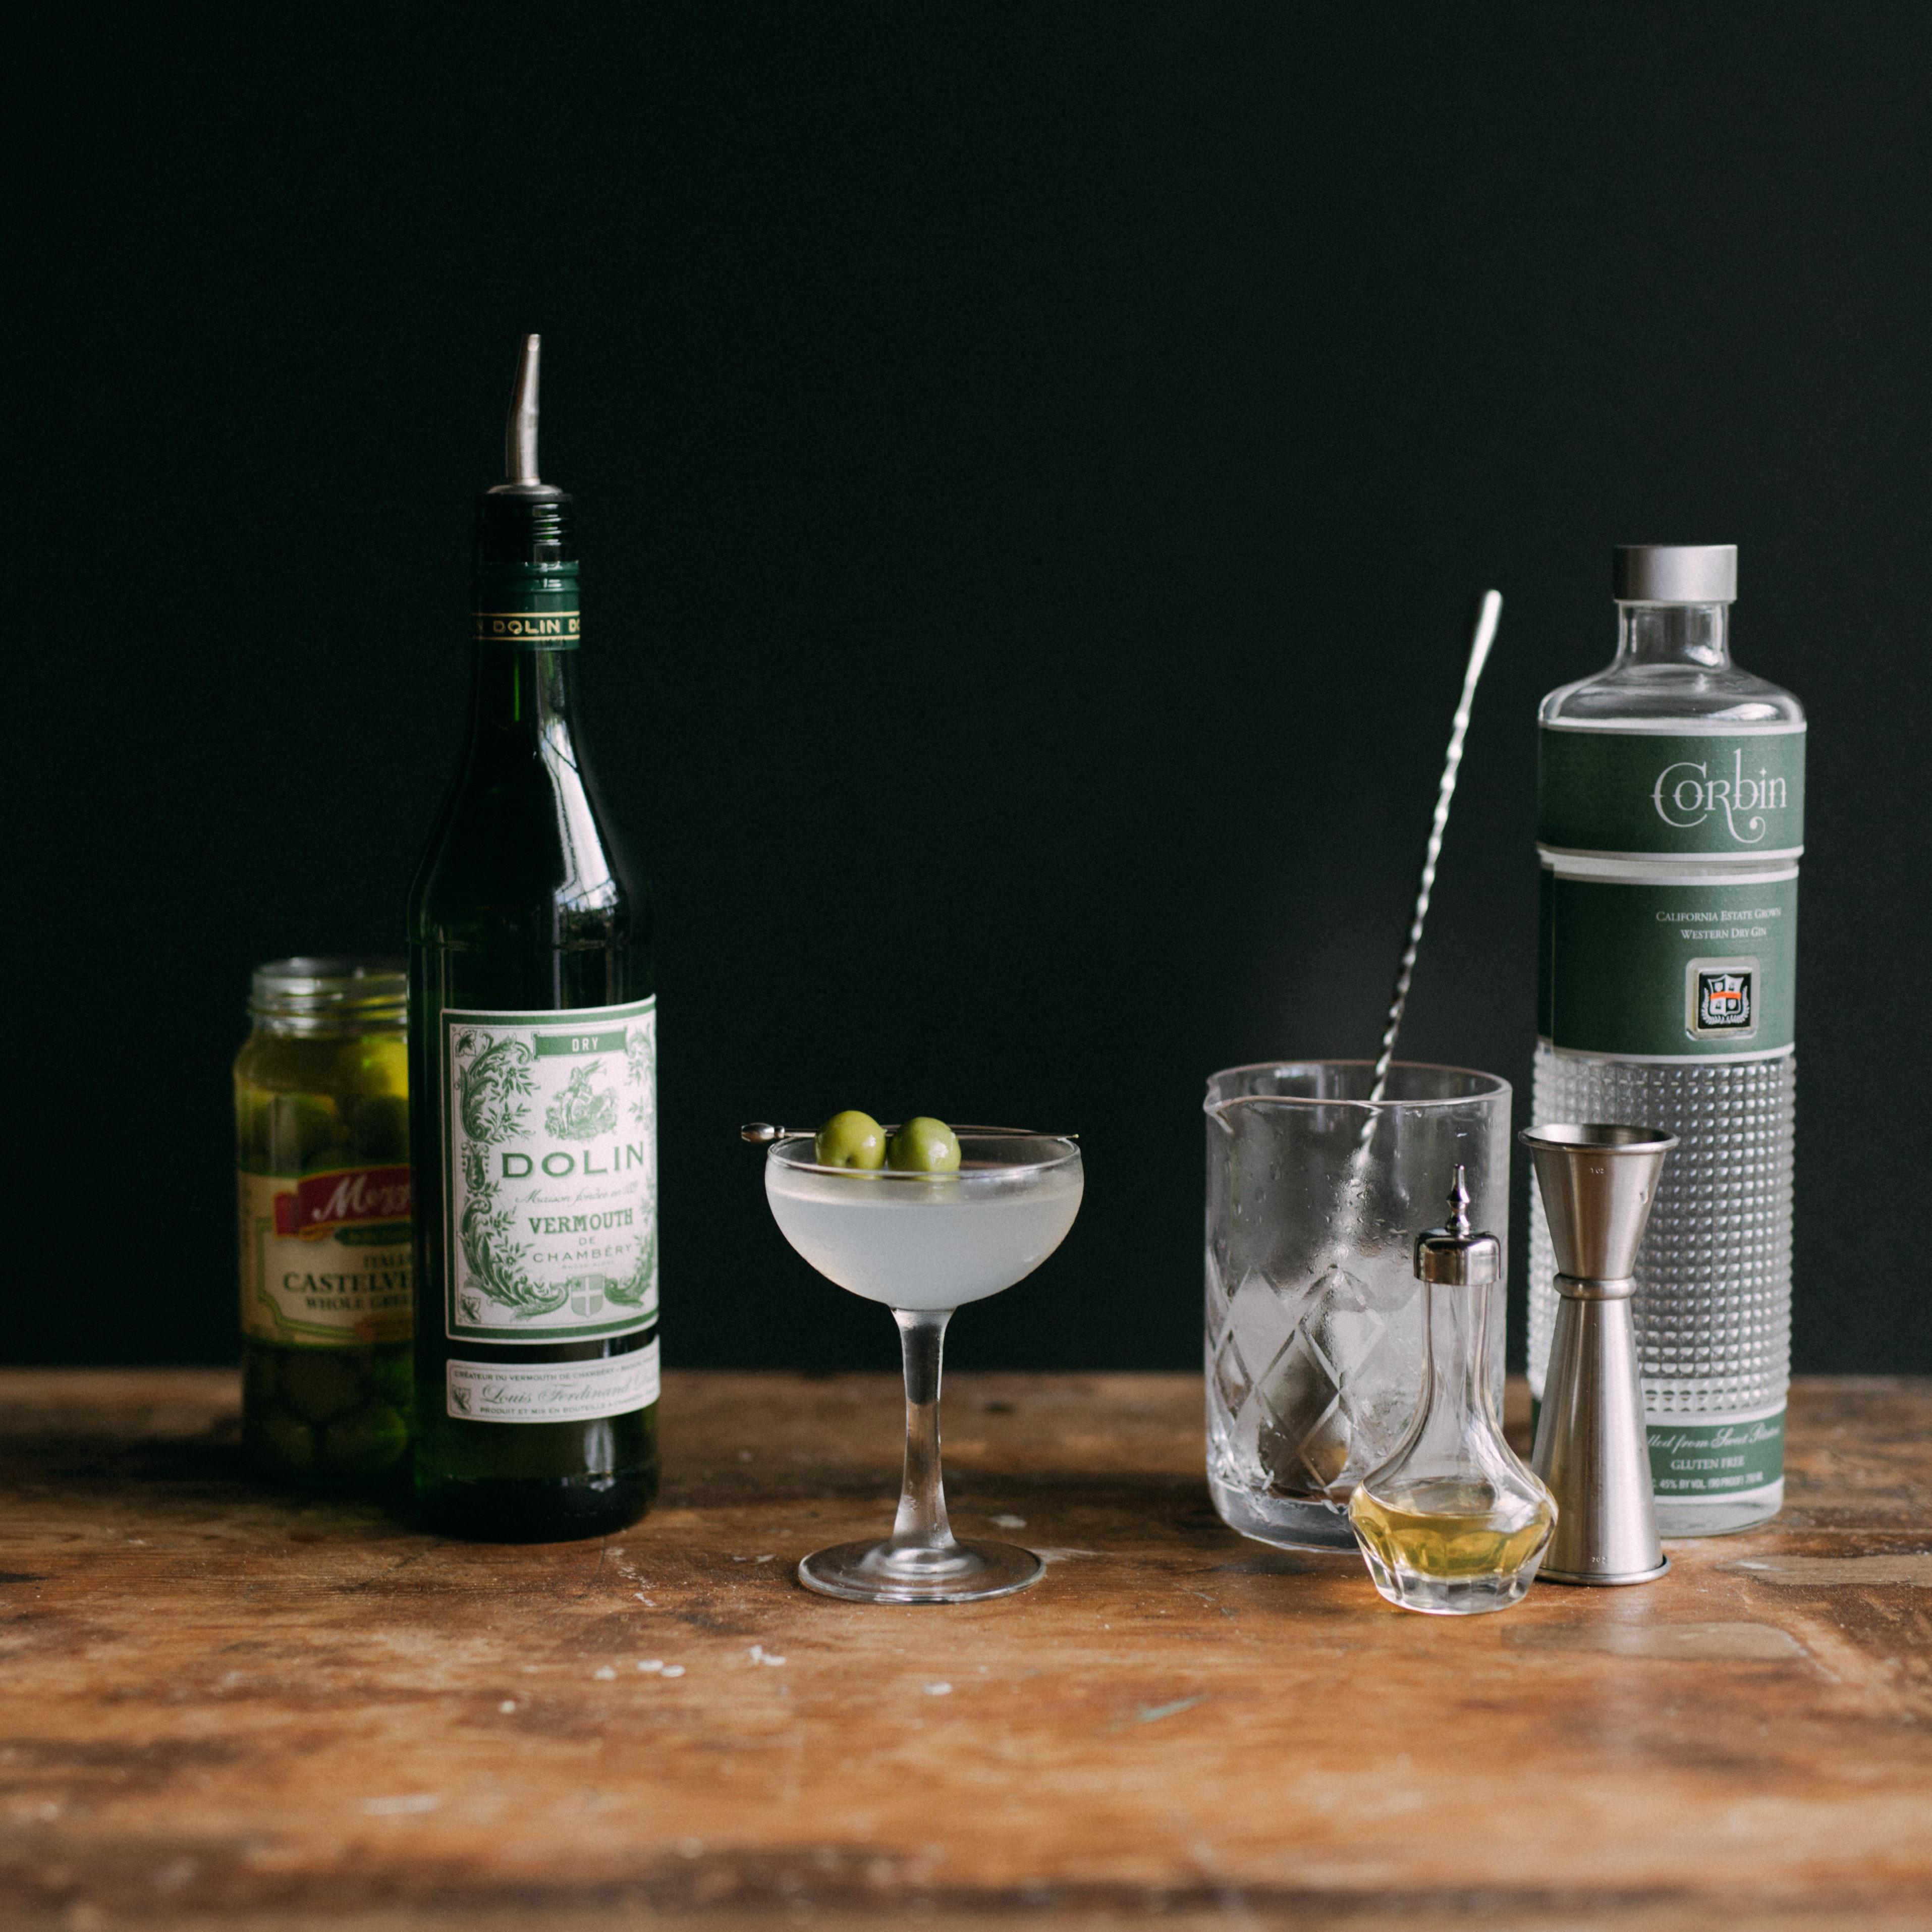 Vermouth Martini, Bitters, Corbin Gin